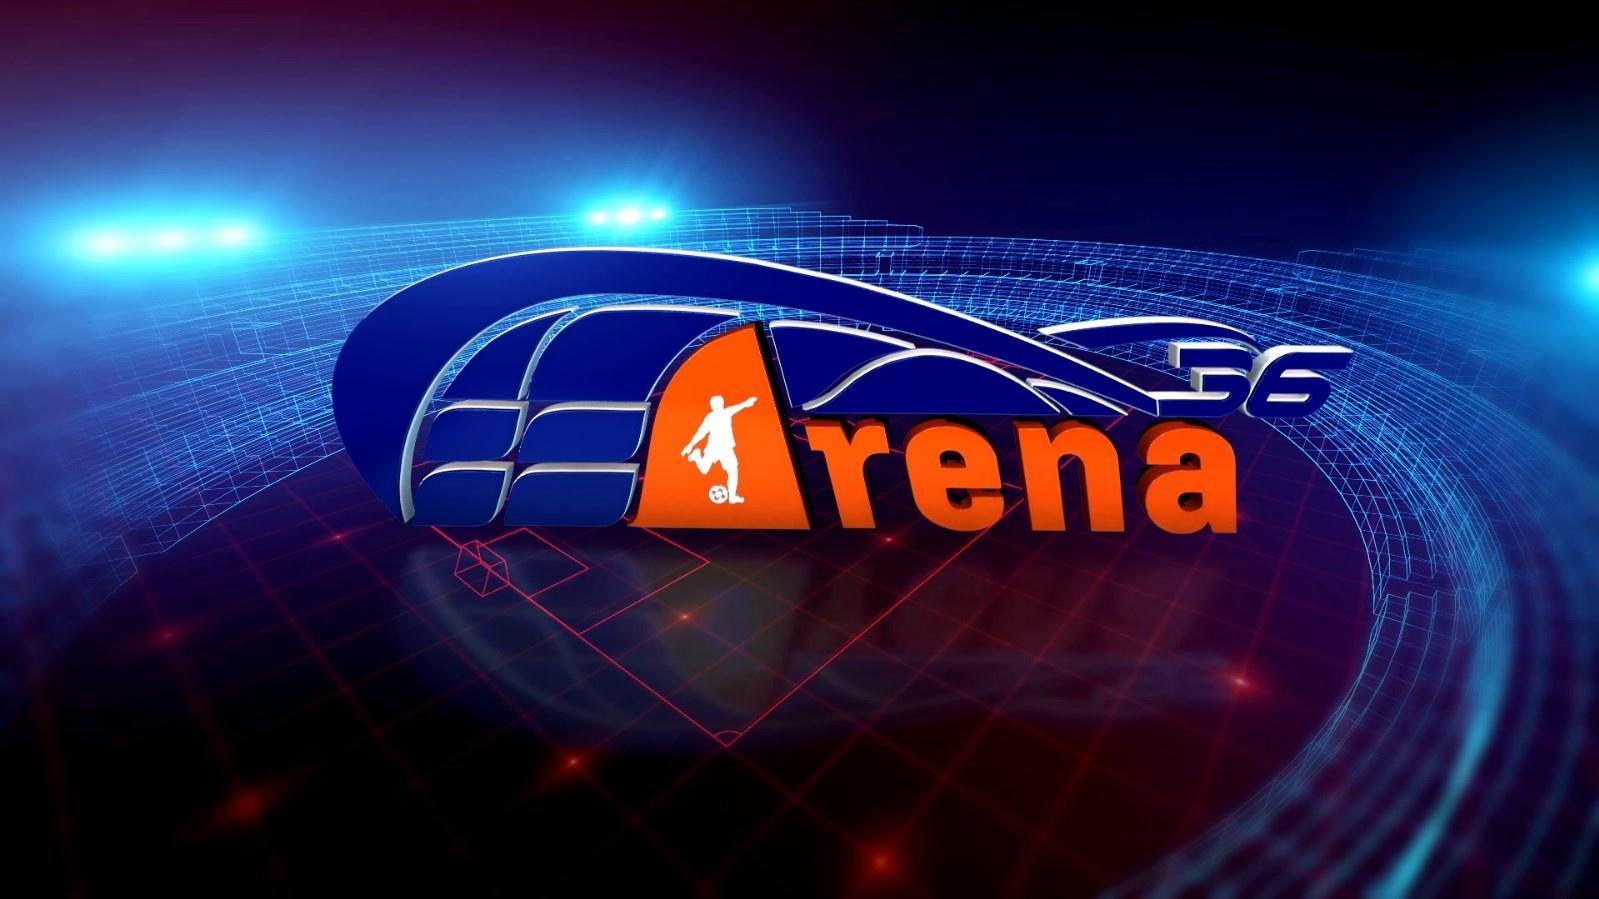 Arena 36